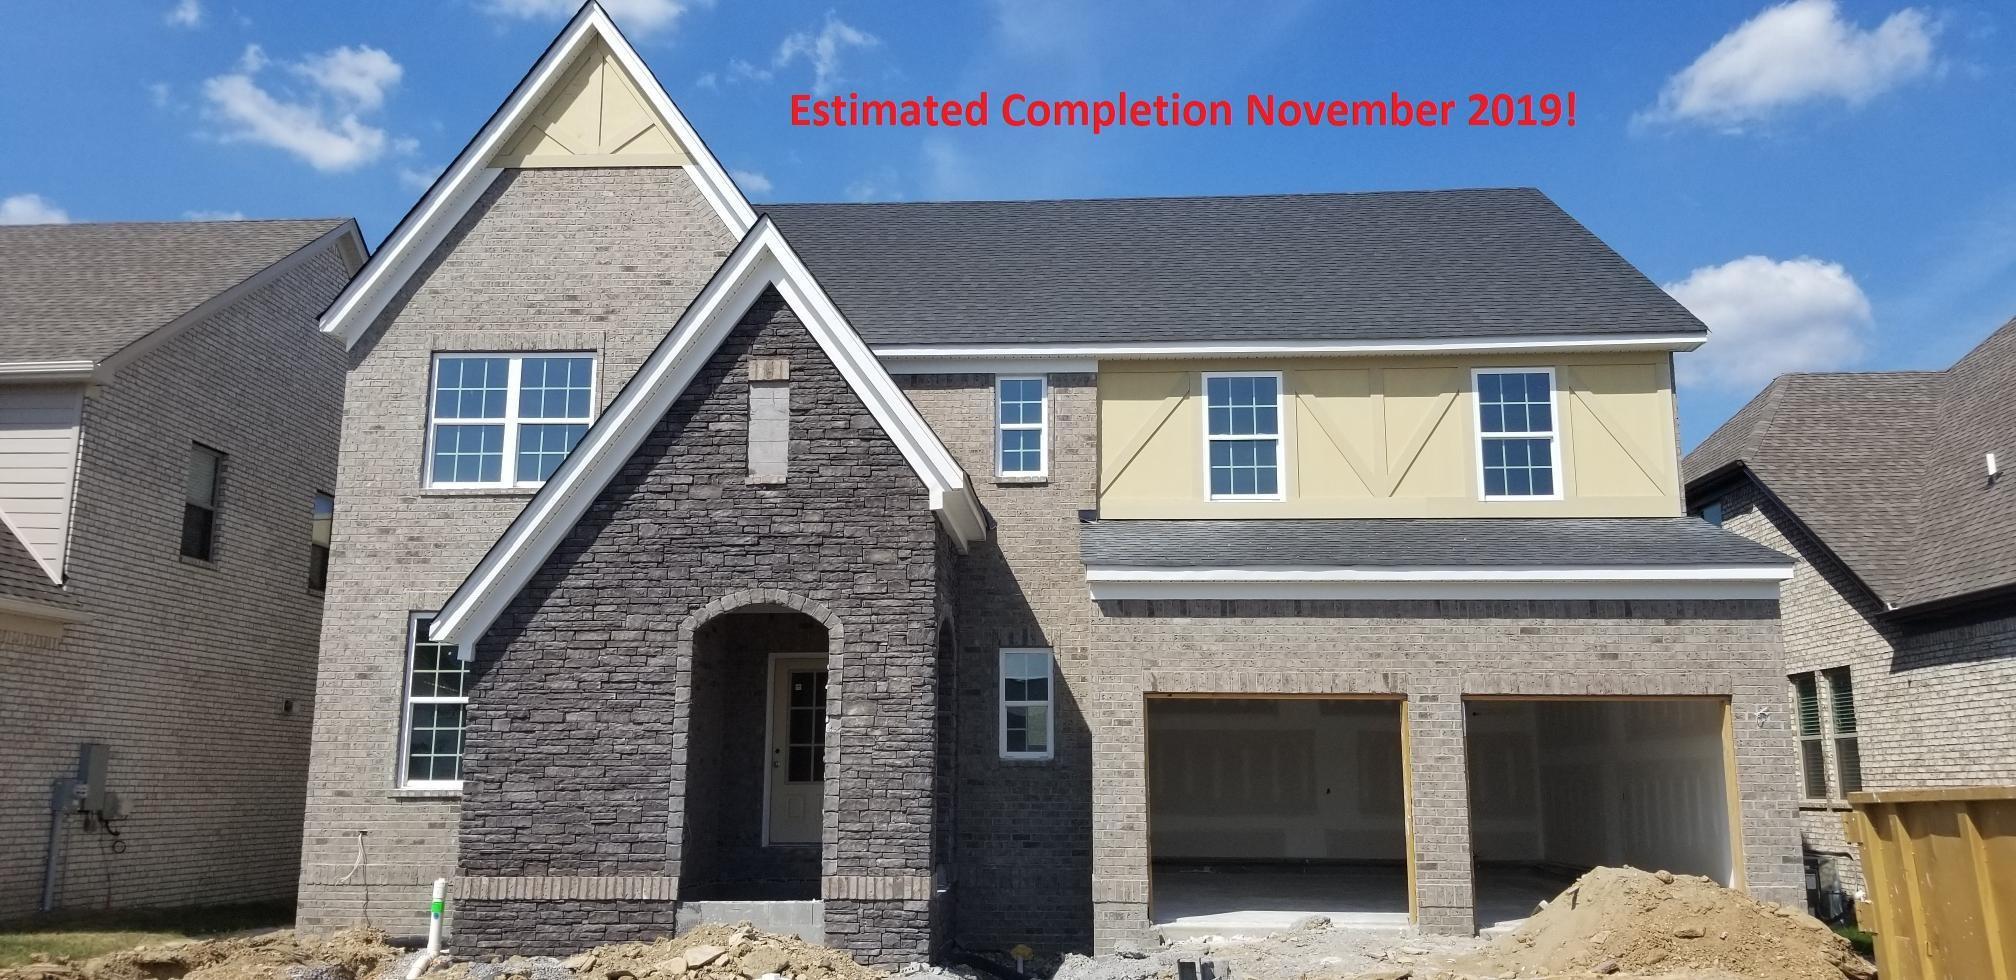 1816 Apperley Drive, Lot 128, Nolensville, Tennessee